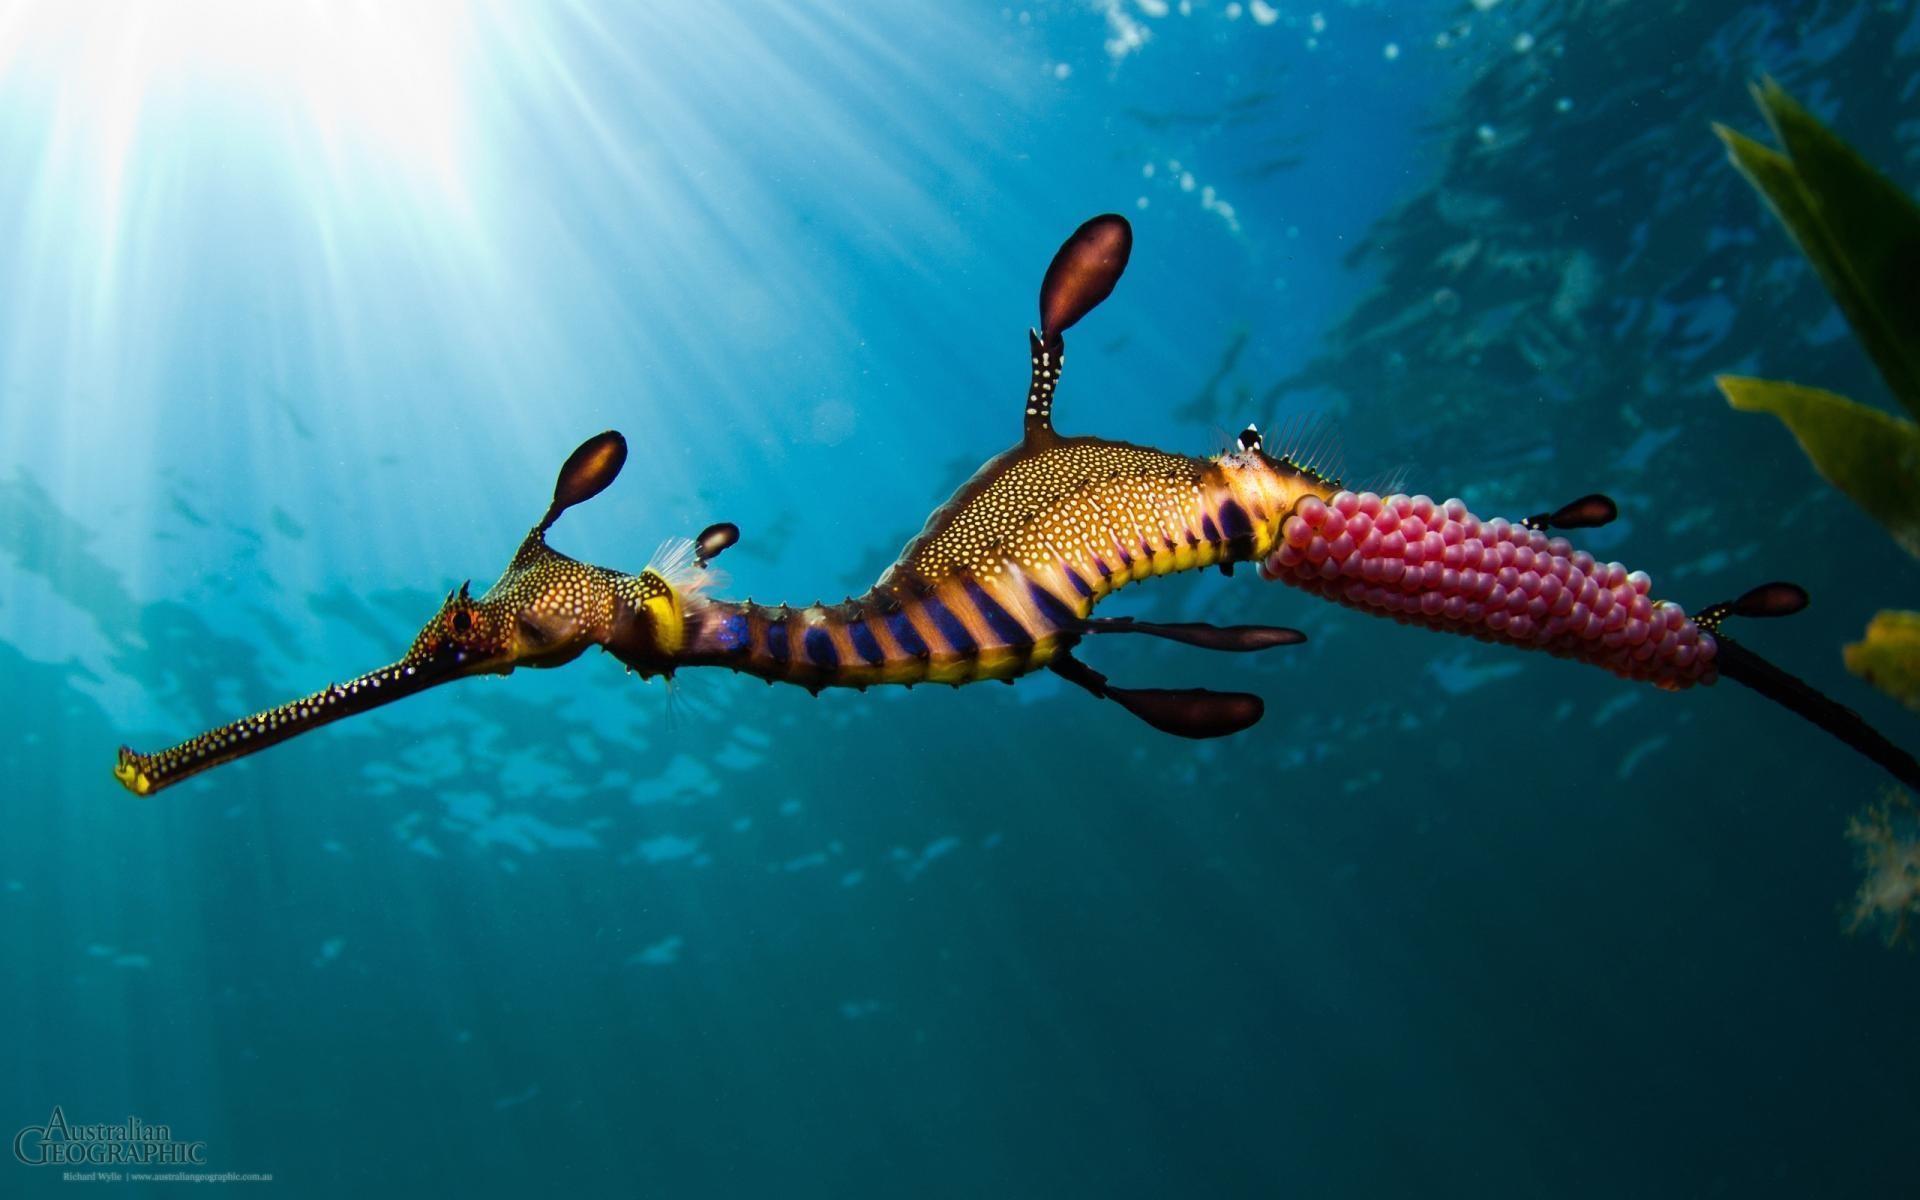 sea creatures wallpaper 53 images